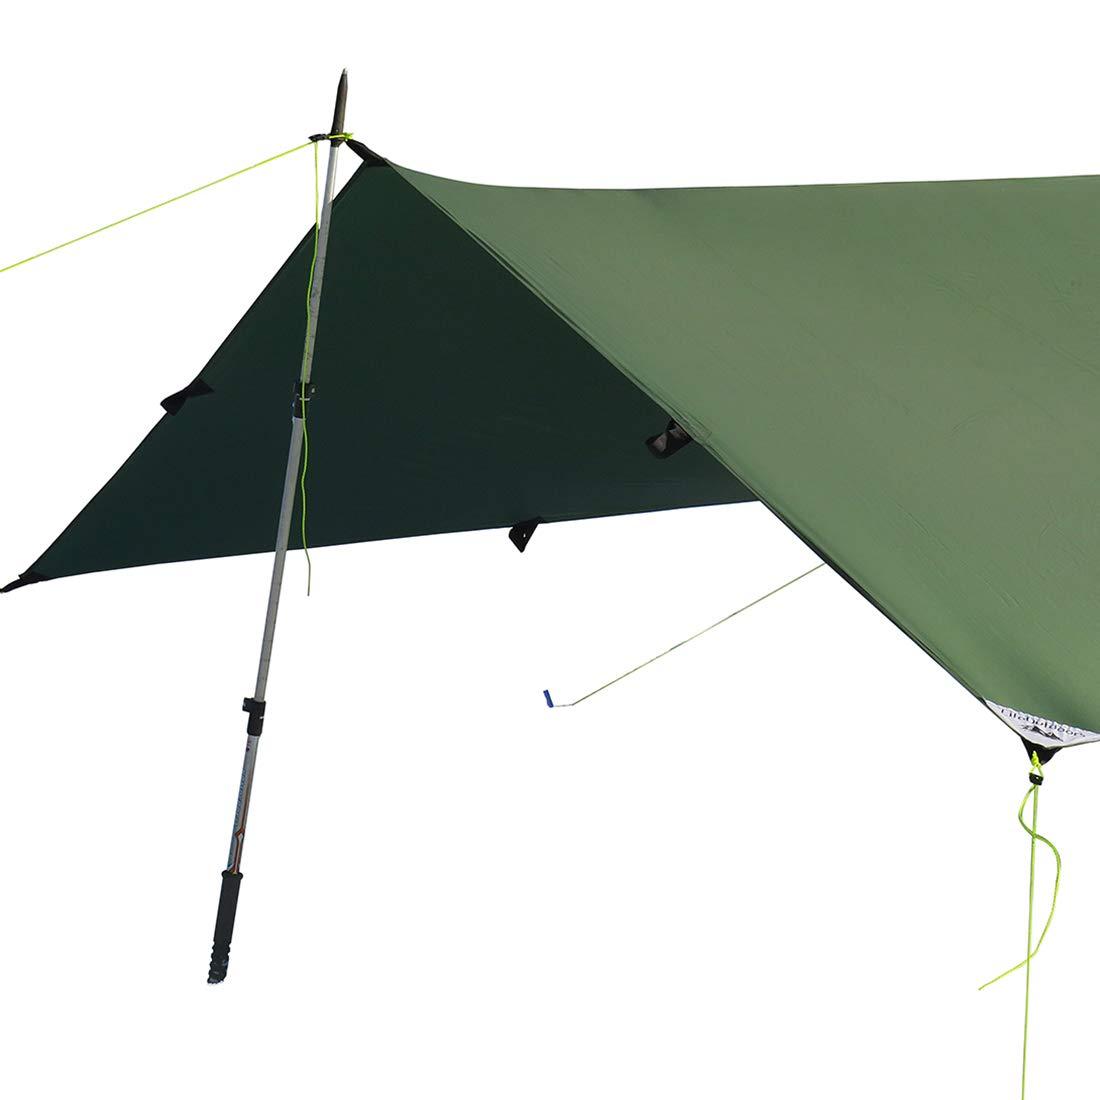 LiteOutdoors Silnylon Tarp - 11.3 Oz. - Ultralight Backpacking Tarp or Hammock Tarp (Green, 8' x 10') by LiteOutdoors